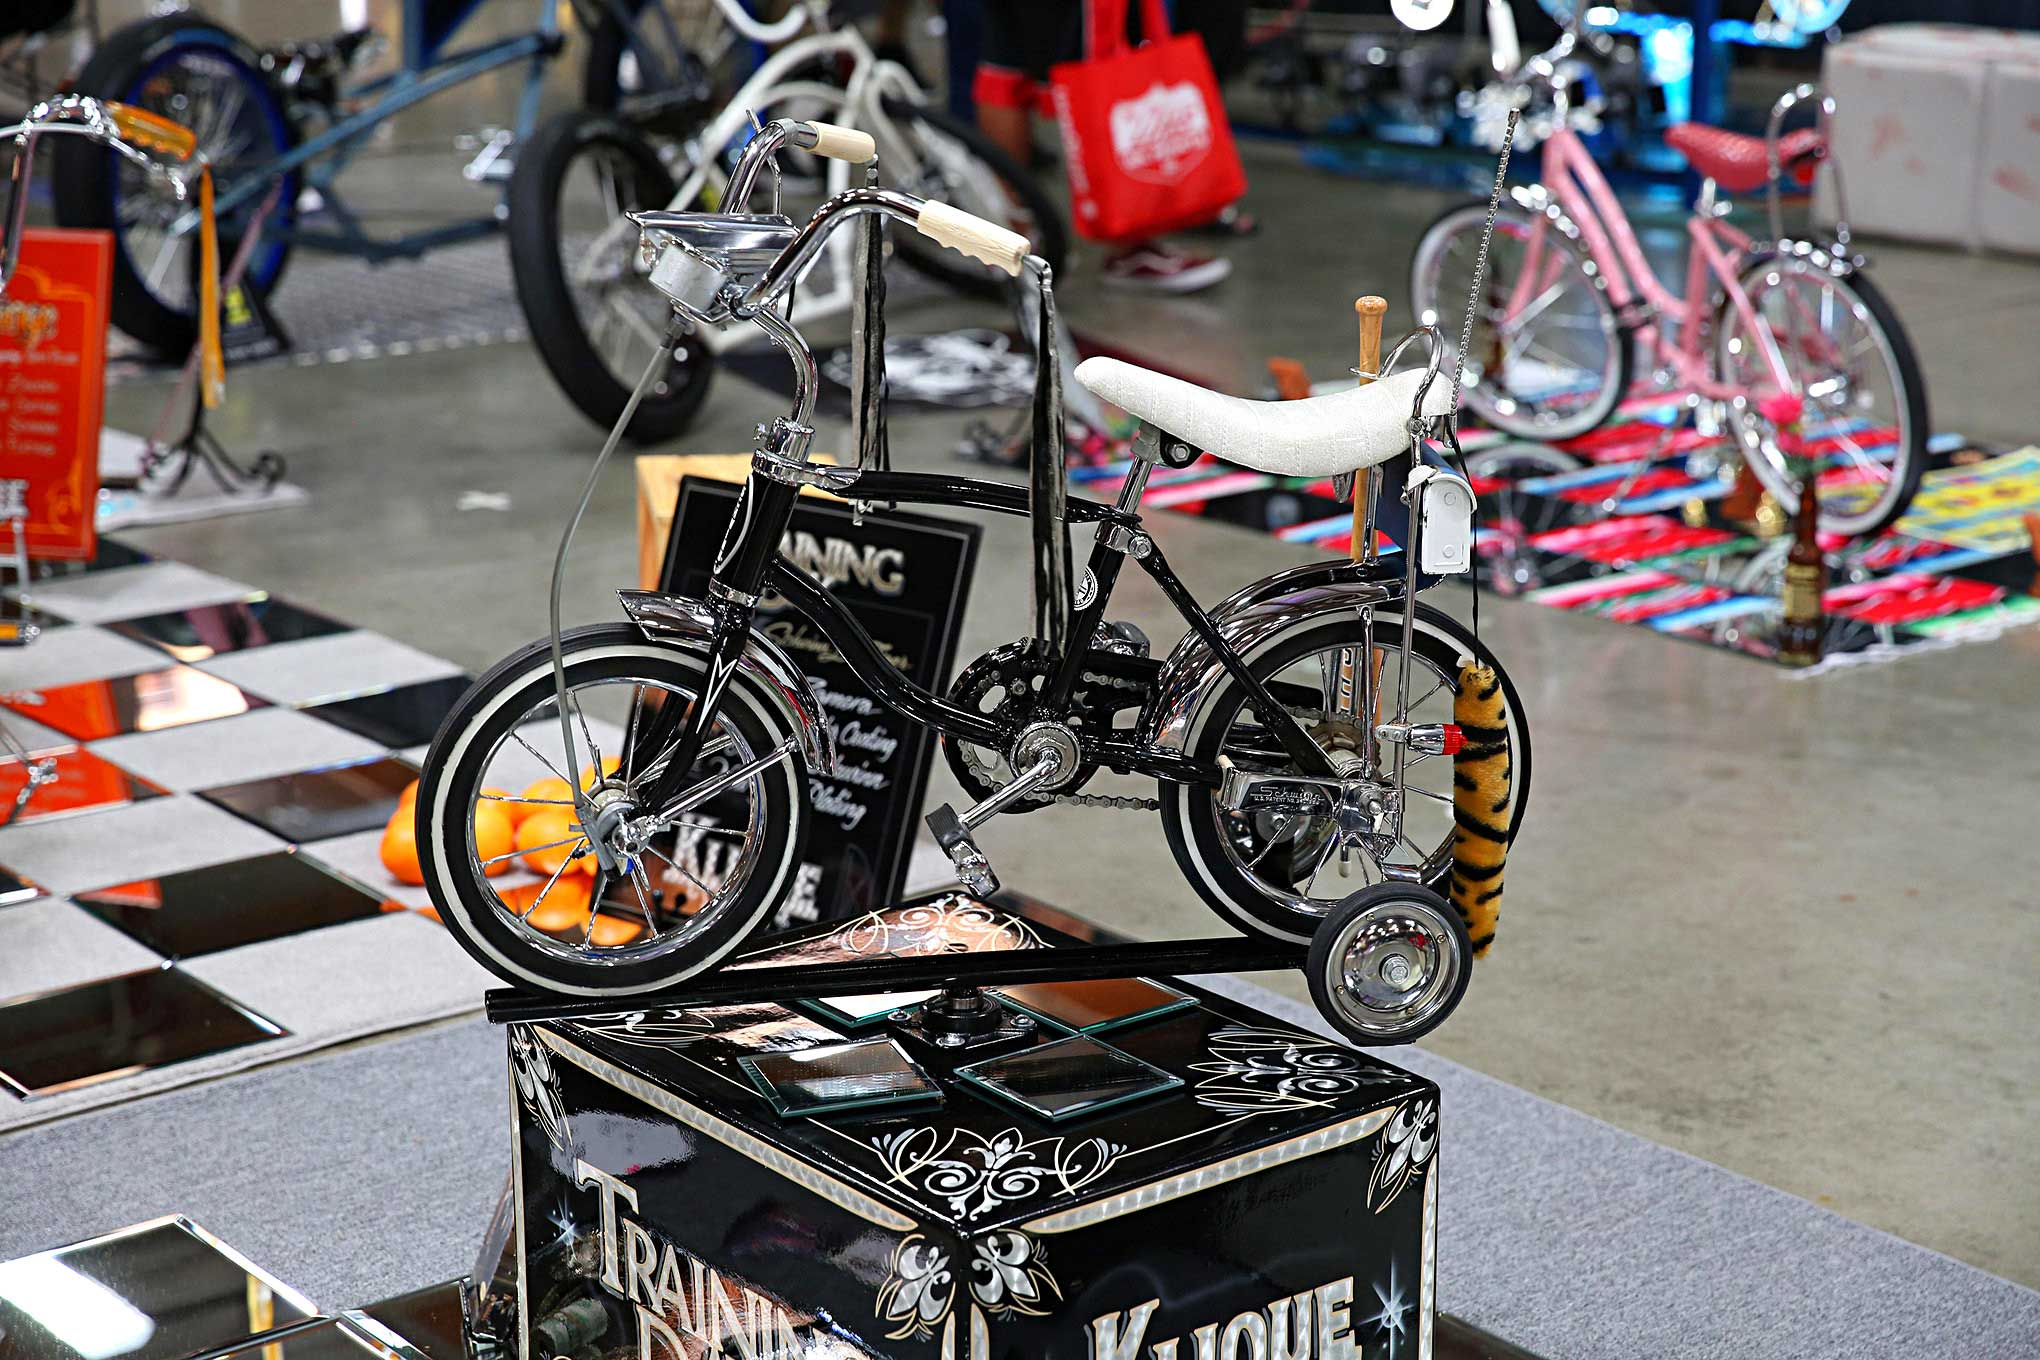 77b65325039 2018 Lowrider Bike And Model Car Show Schwinn Lil Tiger - Lowrider